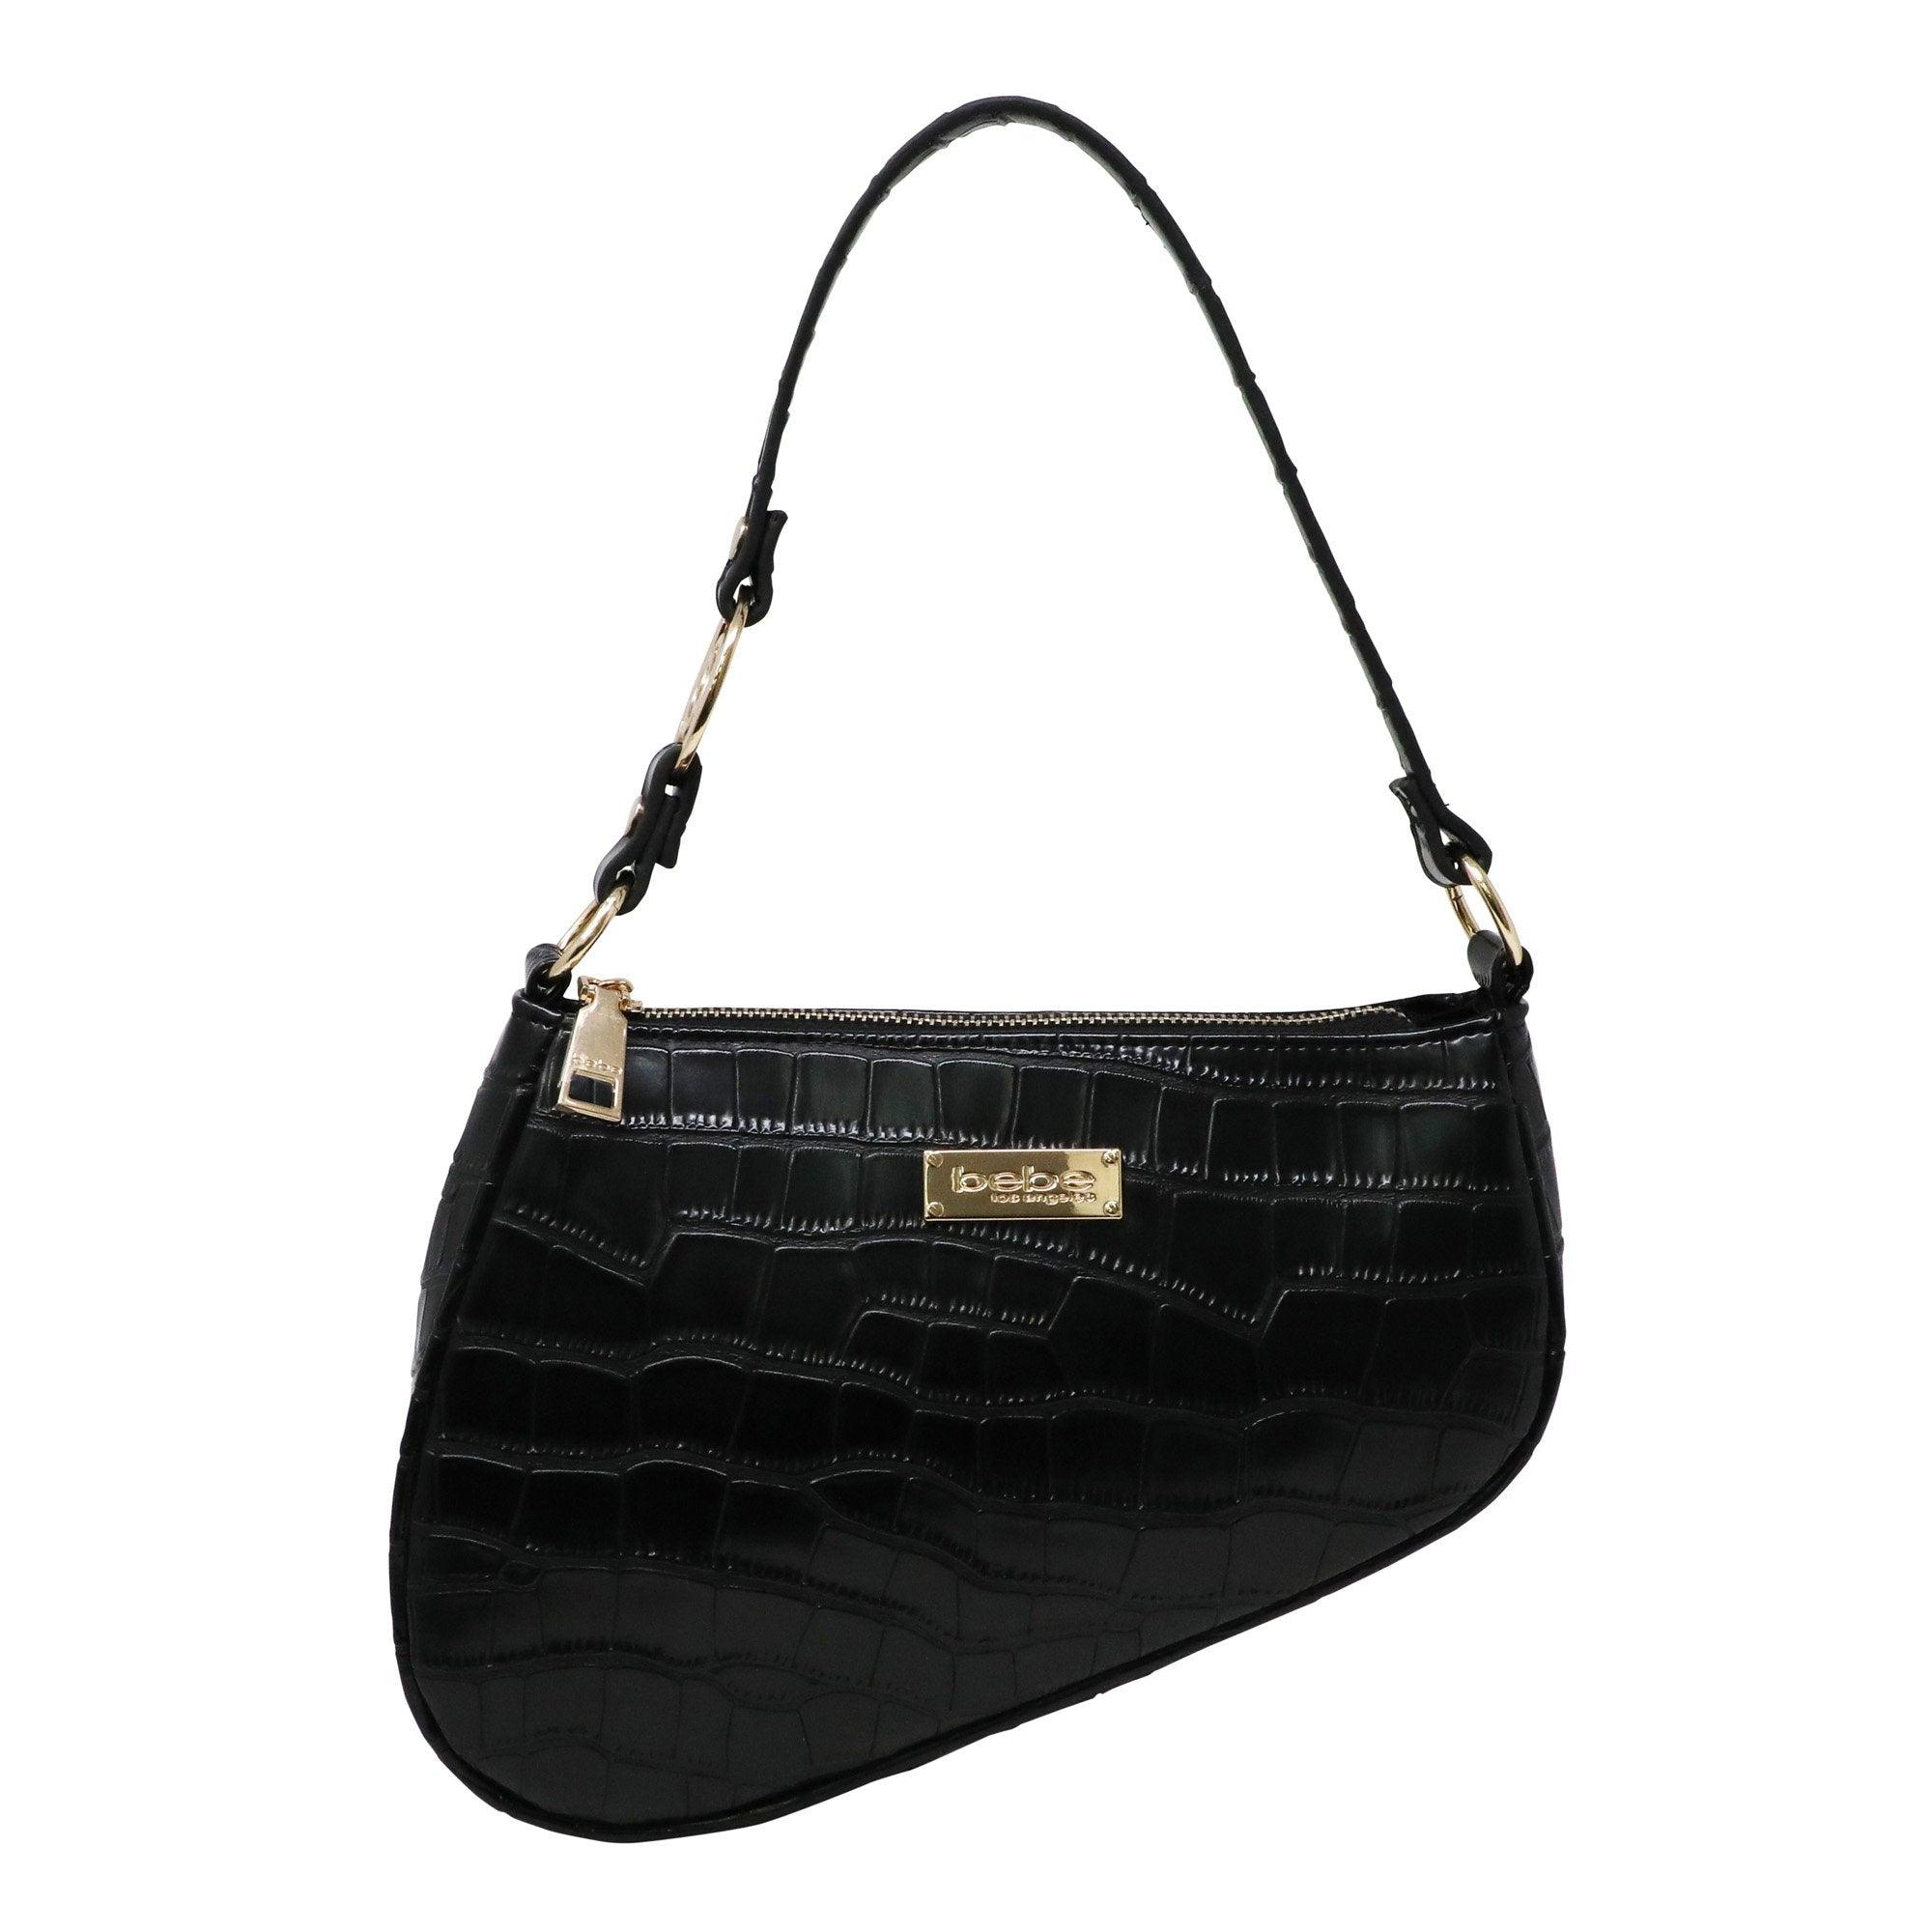 Bebe Women's Tara Saddle Shoulder Medium Bag in Black Polyester